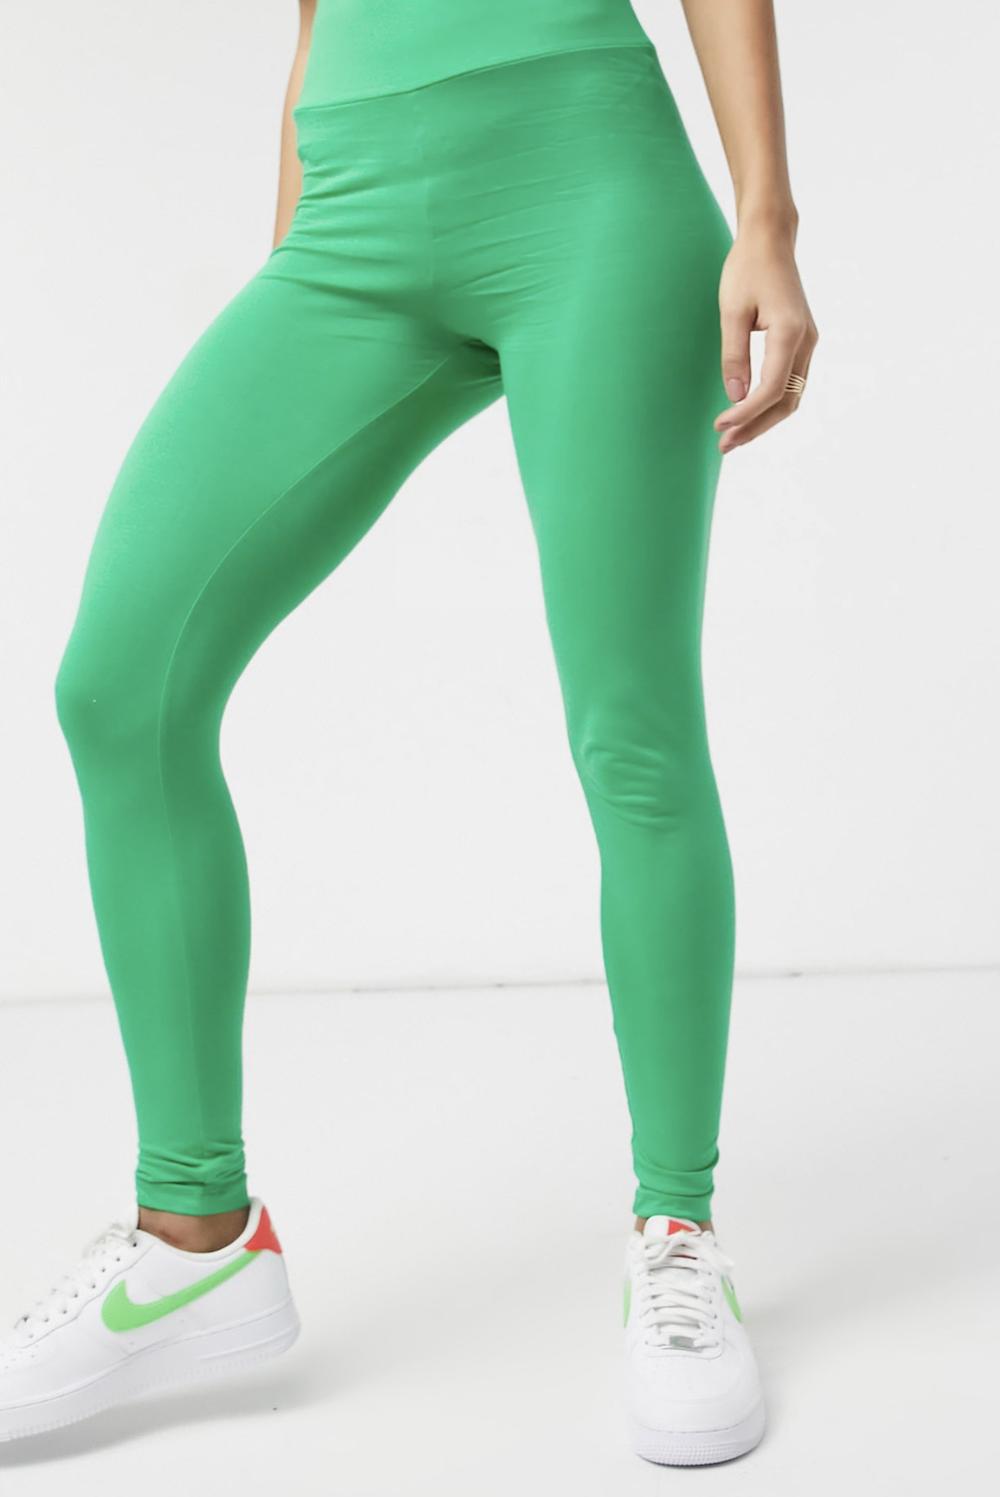 Leggings color verde luminoso con cinturilla ancha de ASOS DESIGN